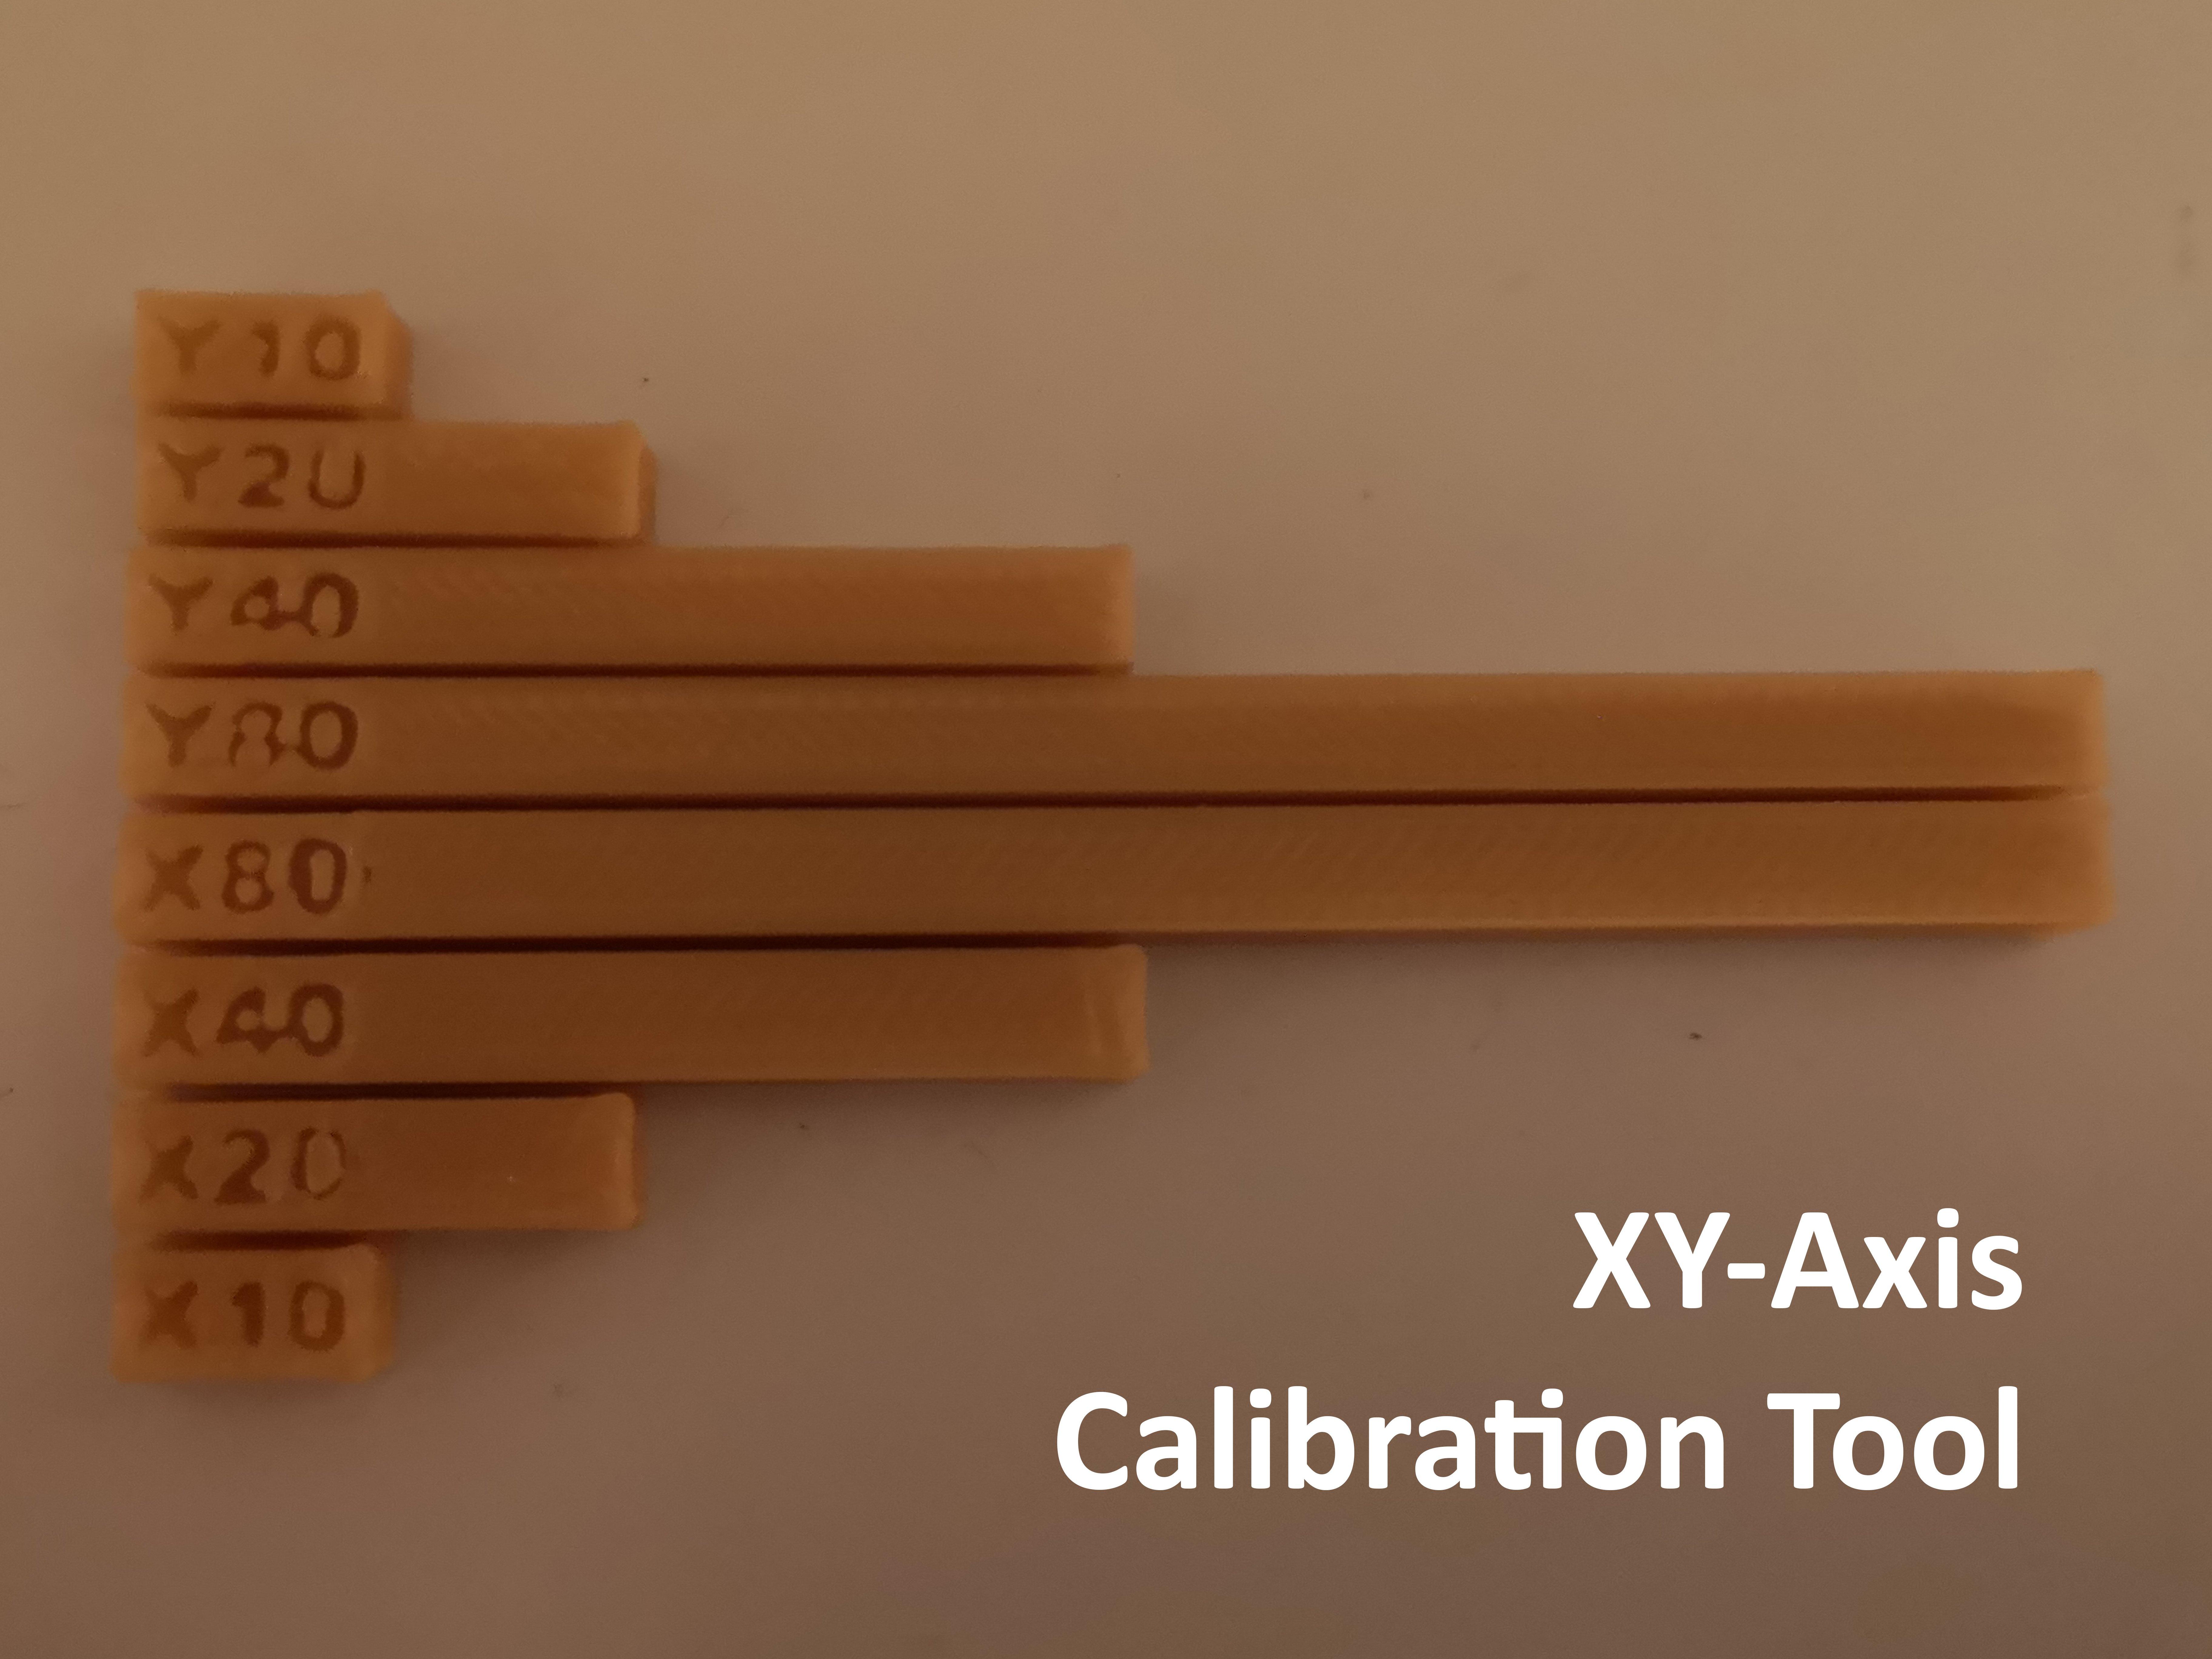 XY-Axis Calibration Tool